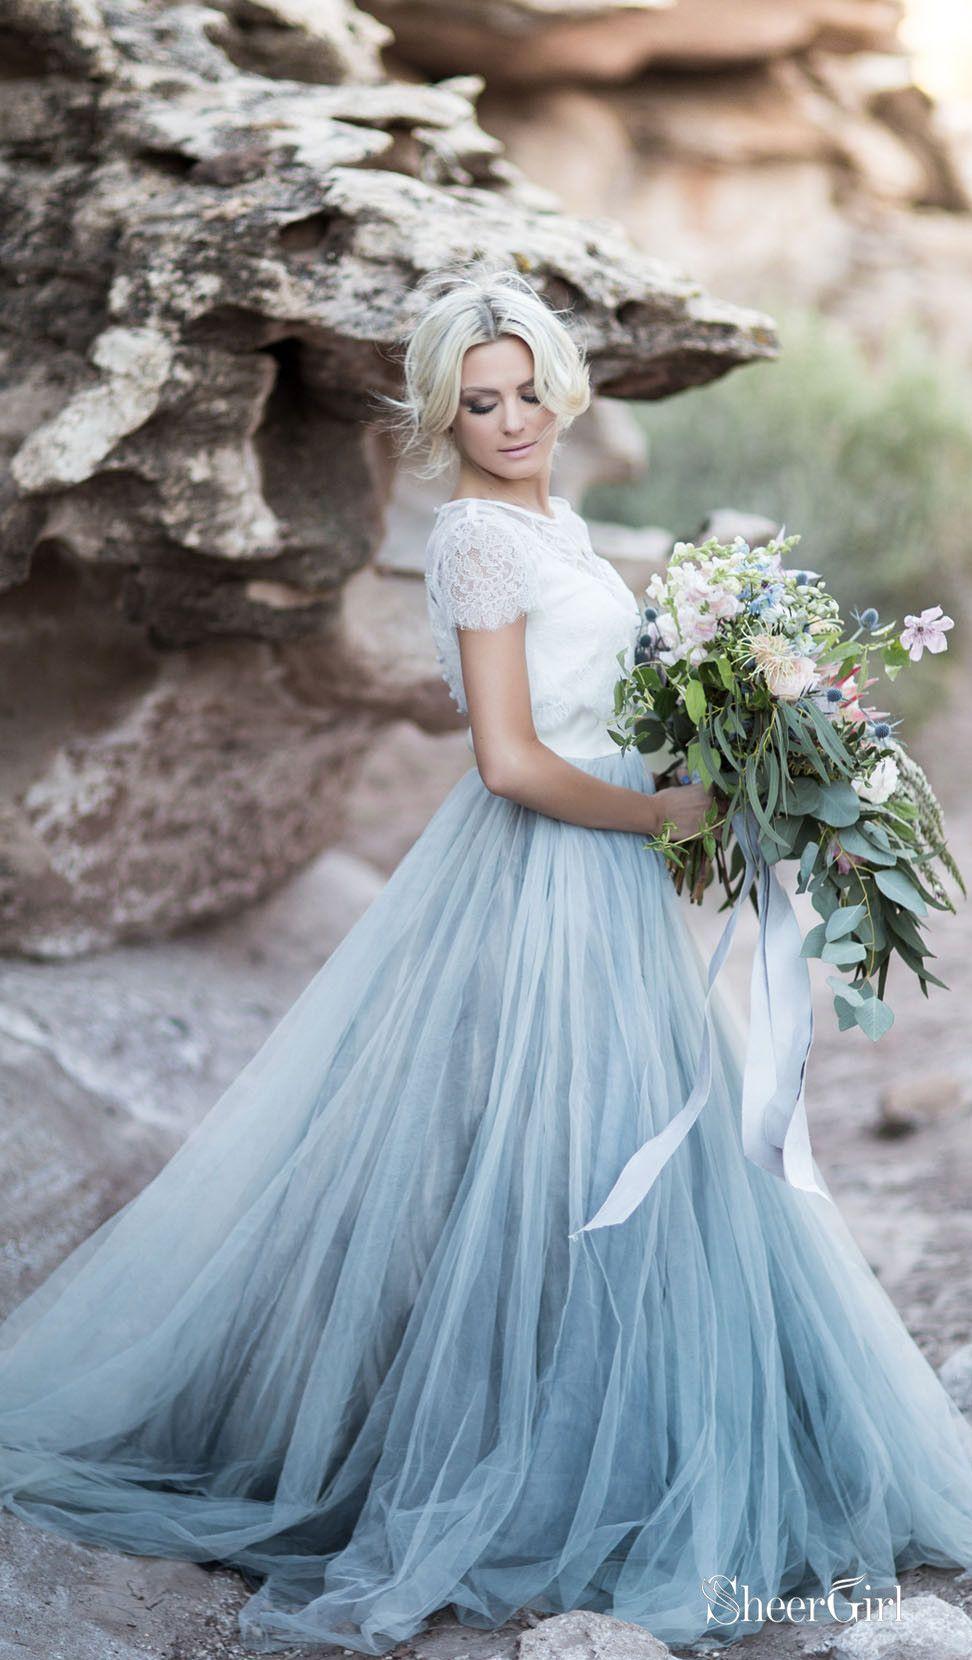 Tropical wedding Alternative wedding Romantic wedding long skirt Beach wedding skirt Dusty blue wedding skirt Bohemian wedding